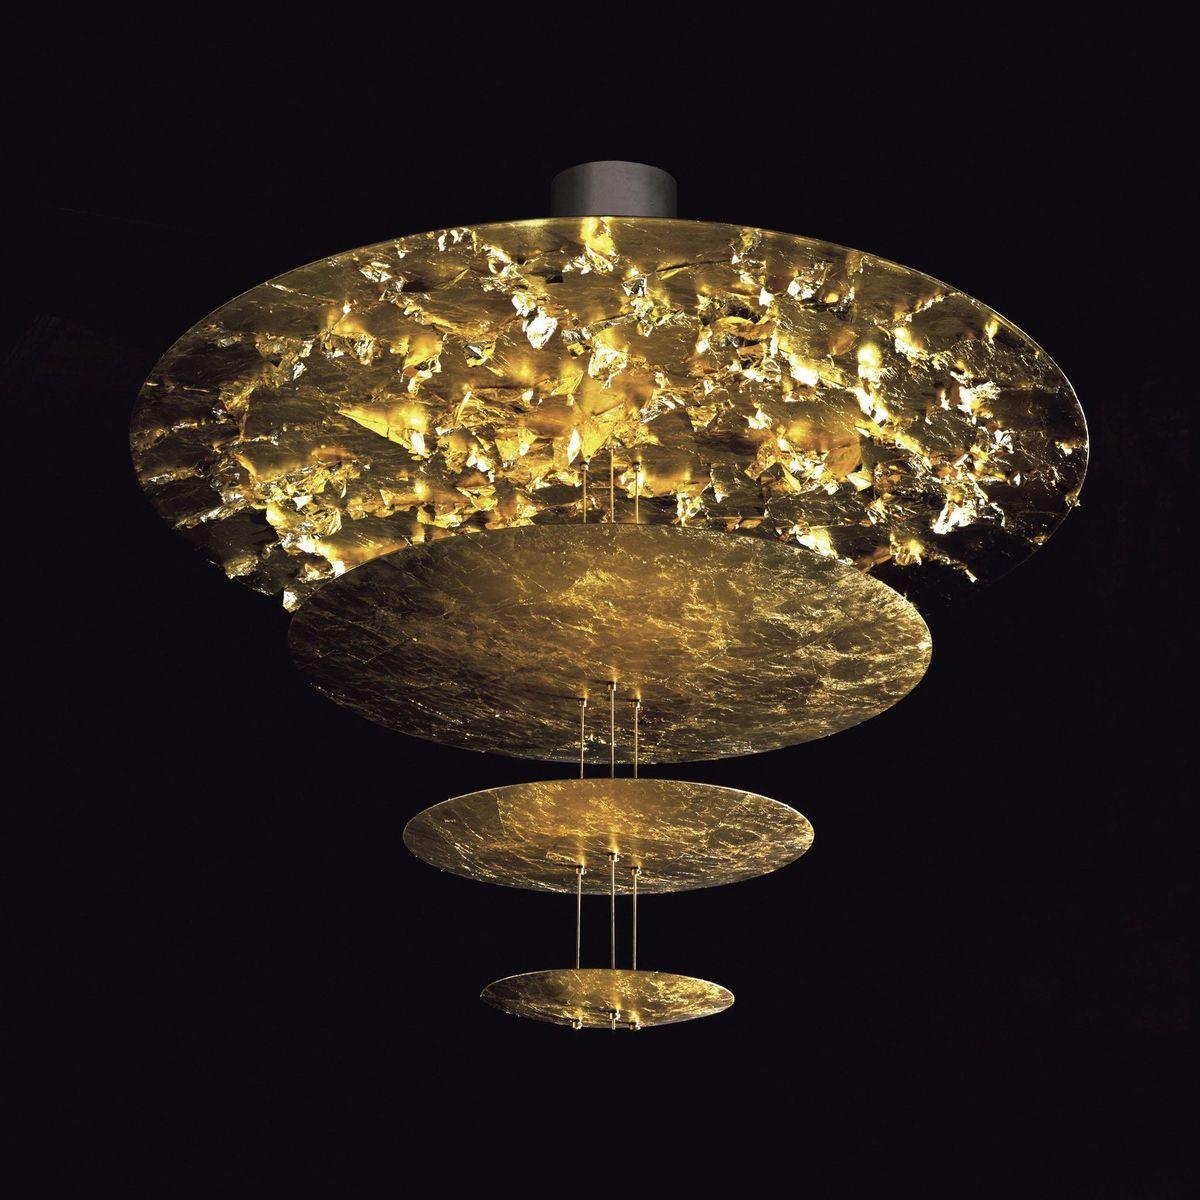 Sistema Macchina Della Luce A Suspended Lamp Catellani Smith Suspension Lamps Lighting Led Leuchten Hangeleuchte Leuchten